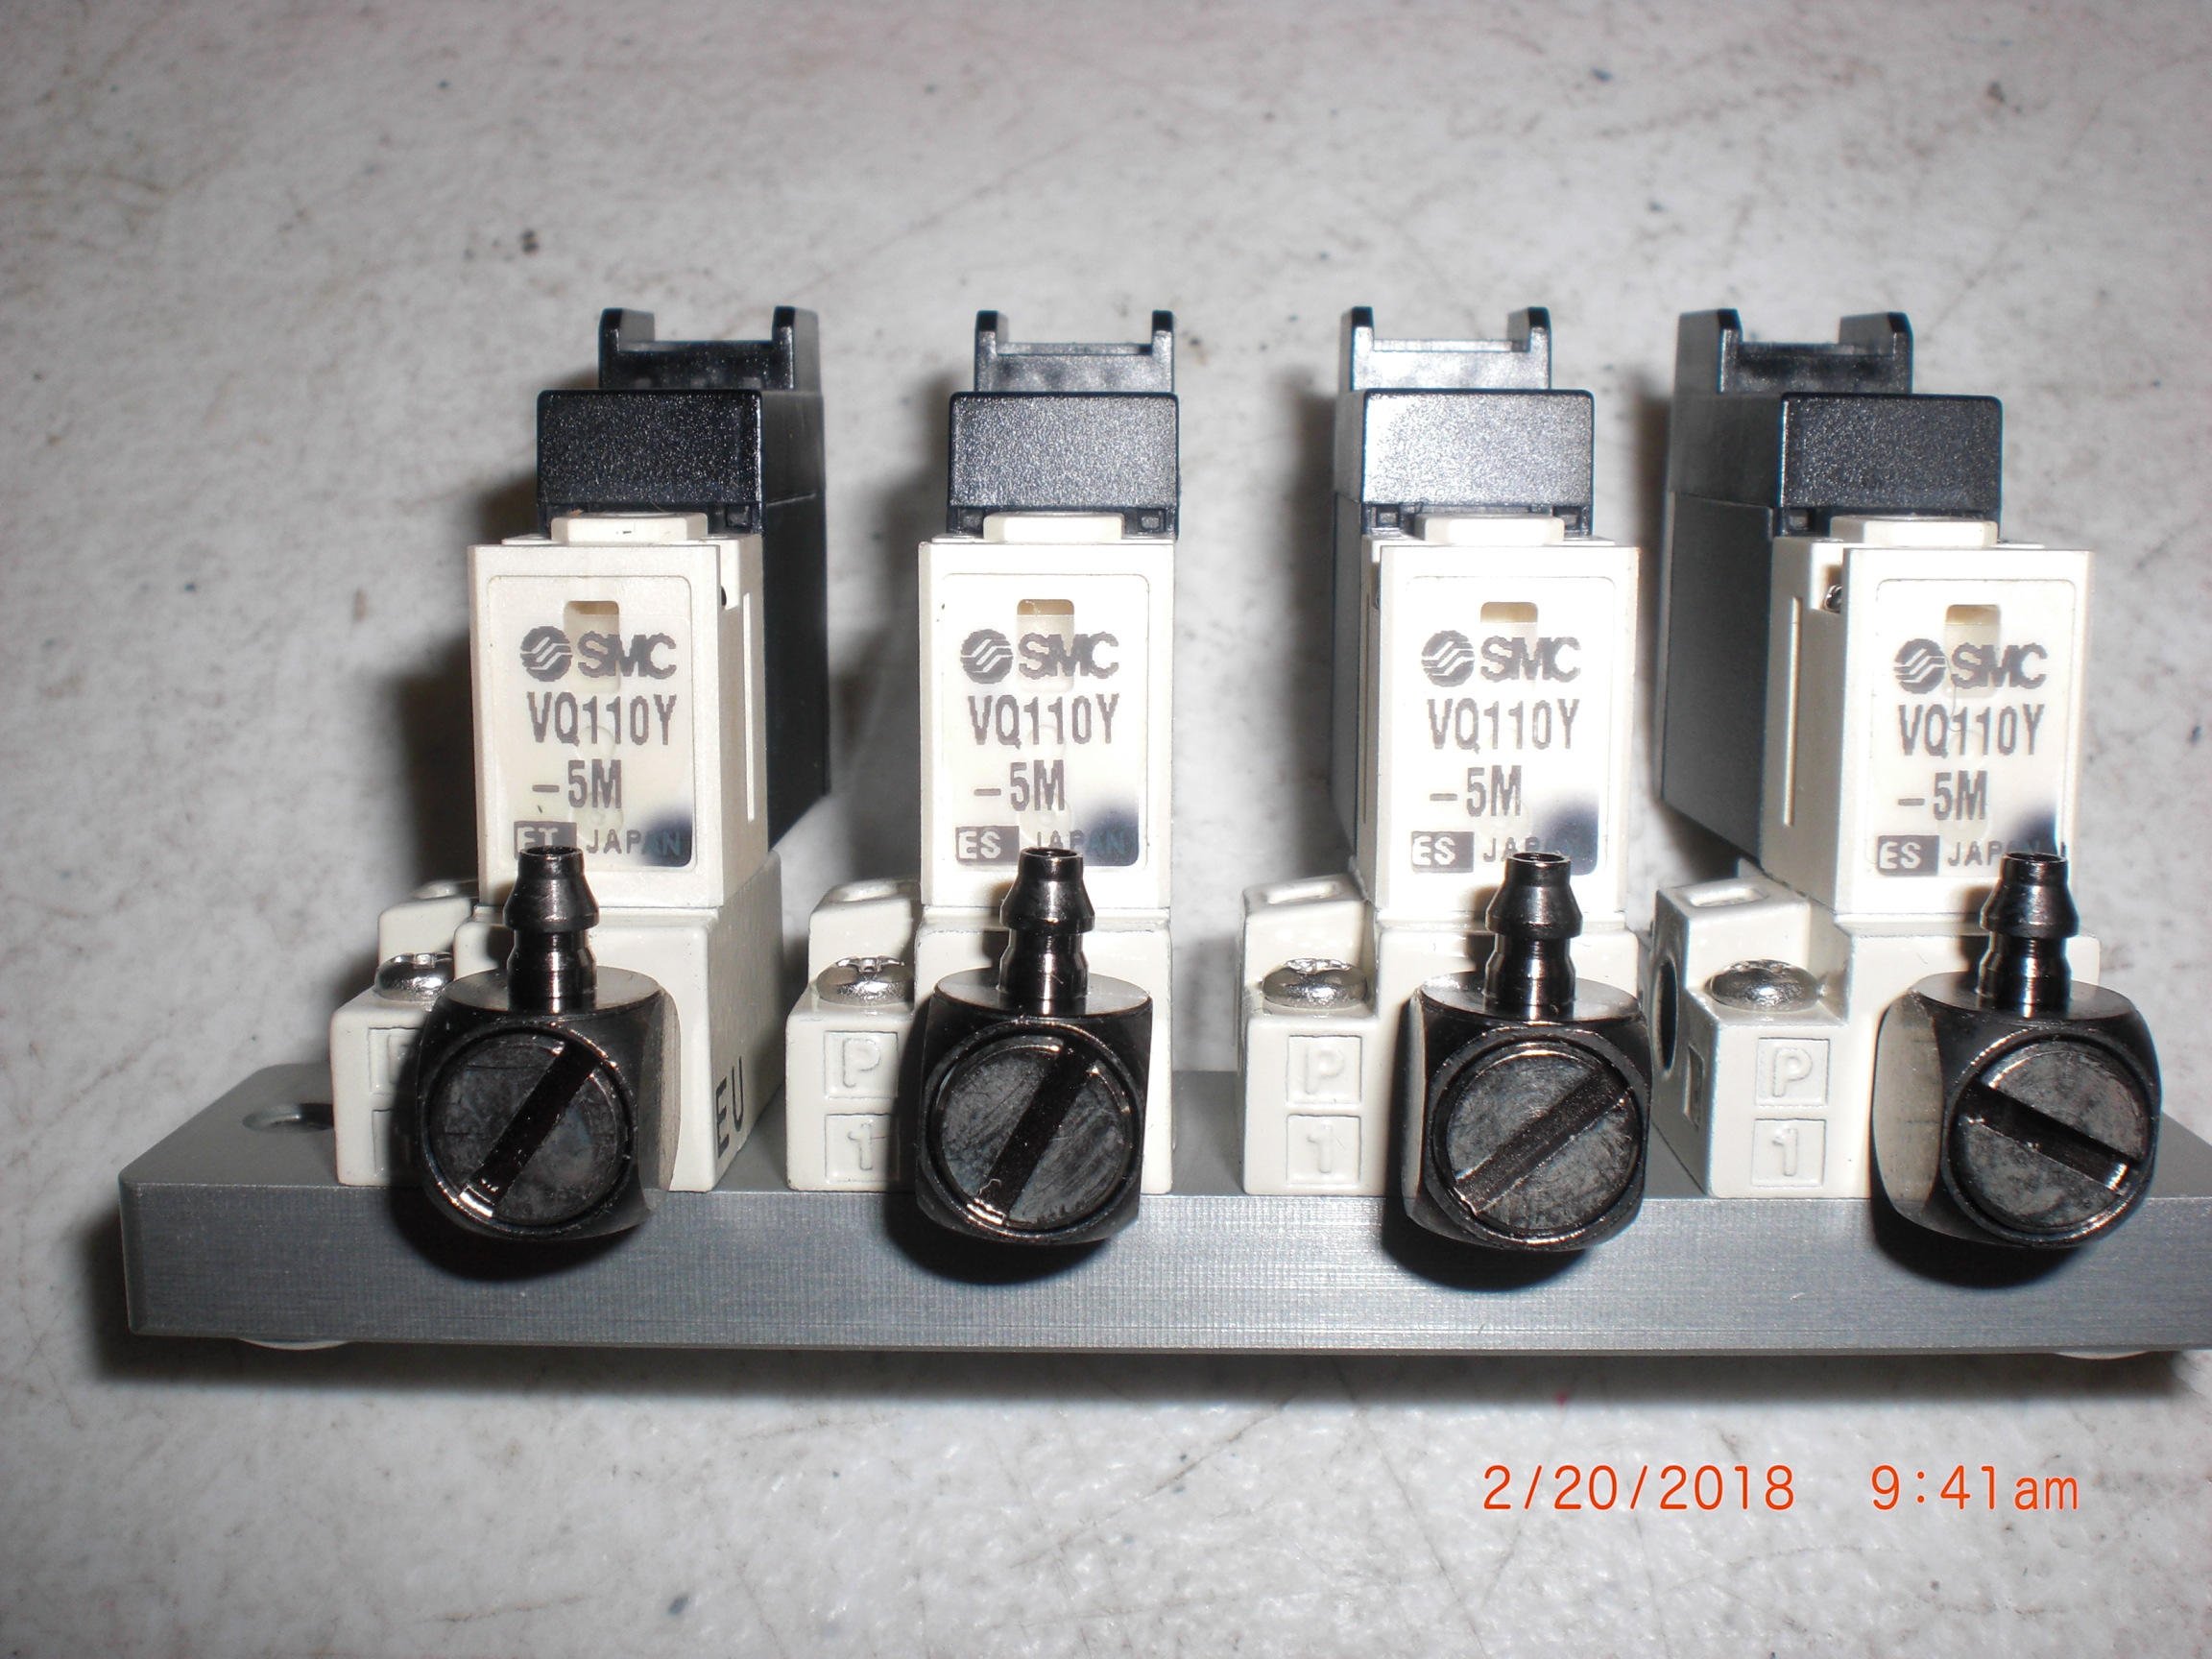 Valve SMC VQ110Y-5M 4 position manifold 24VDC